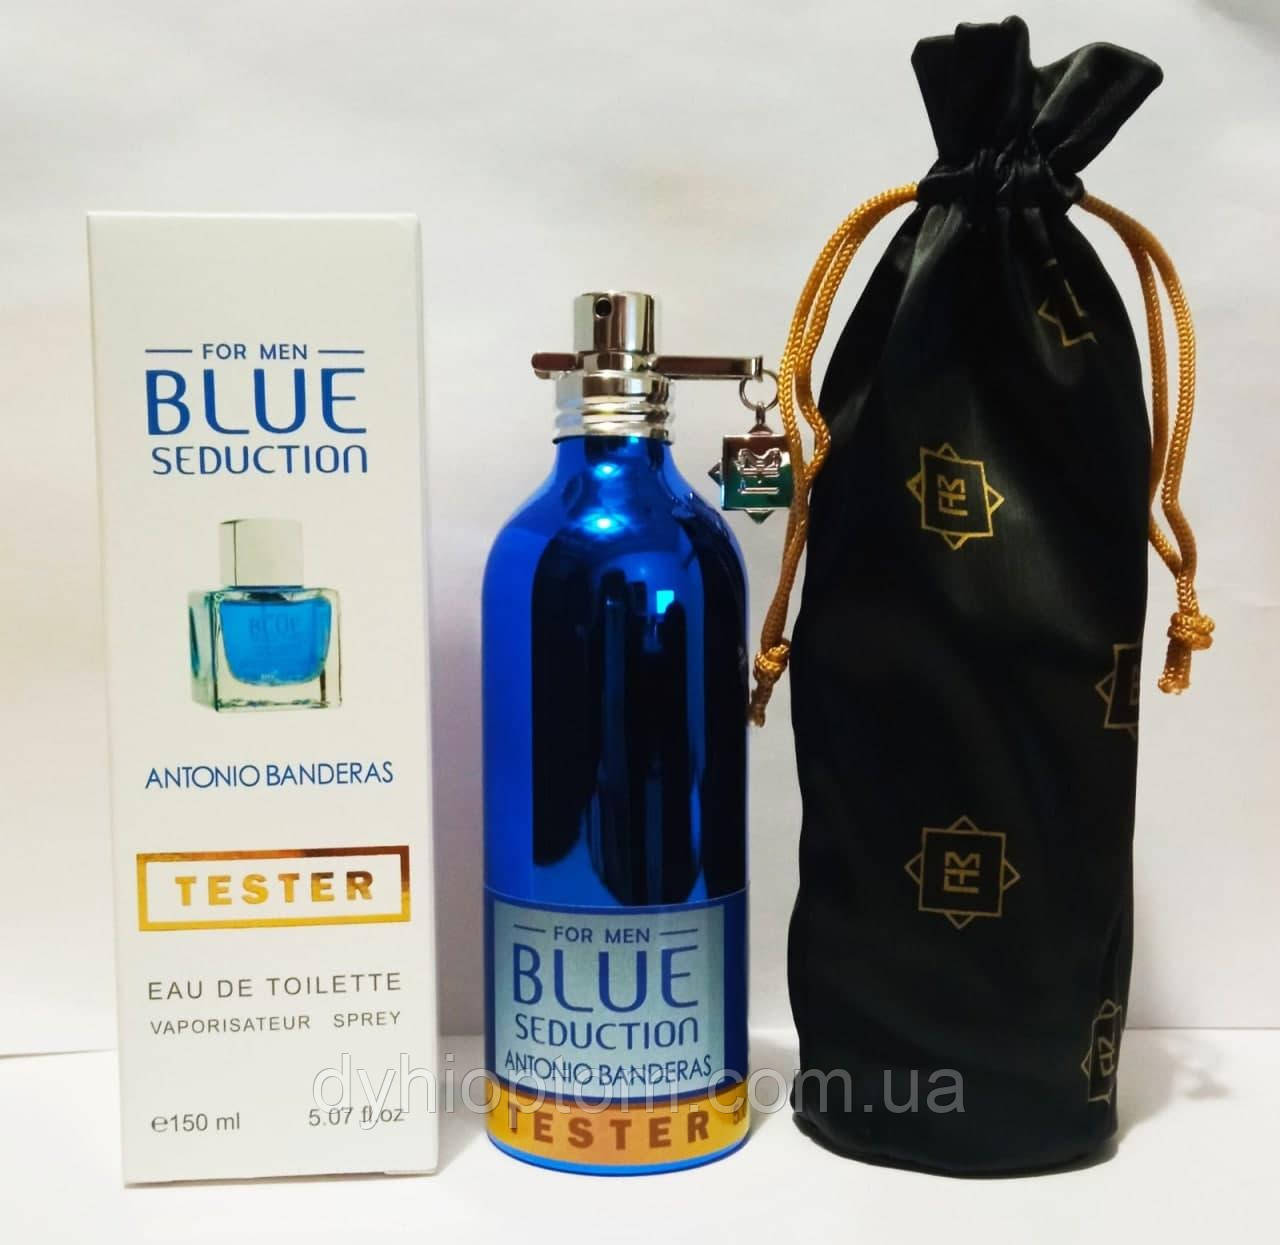 Аналог жіночого парфуму Tom Ford Lost Cherry 110ml